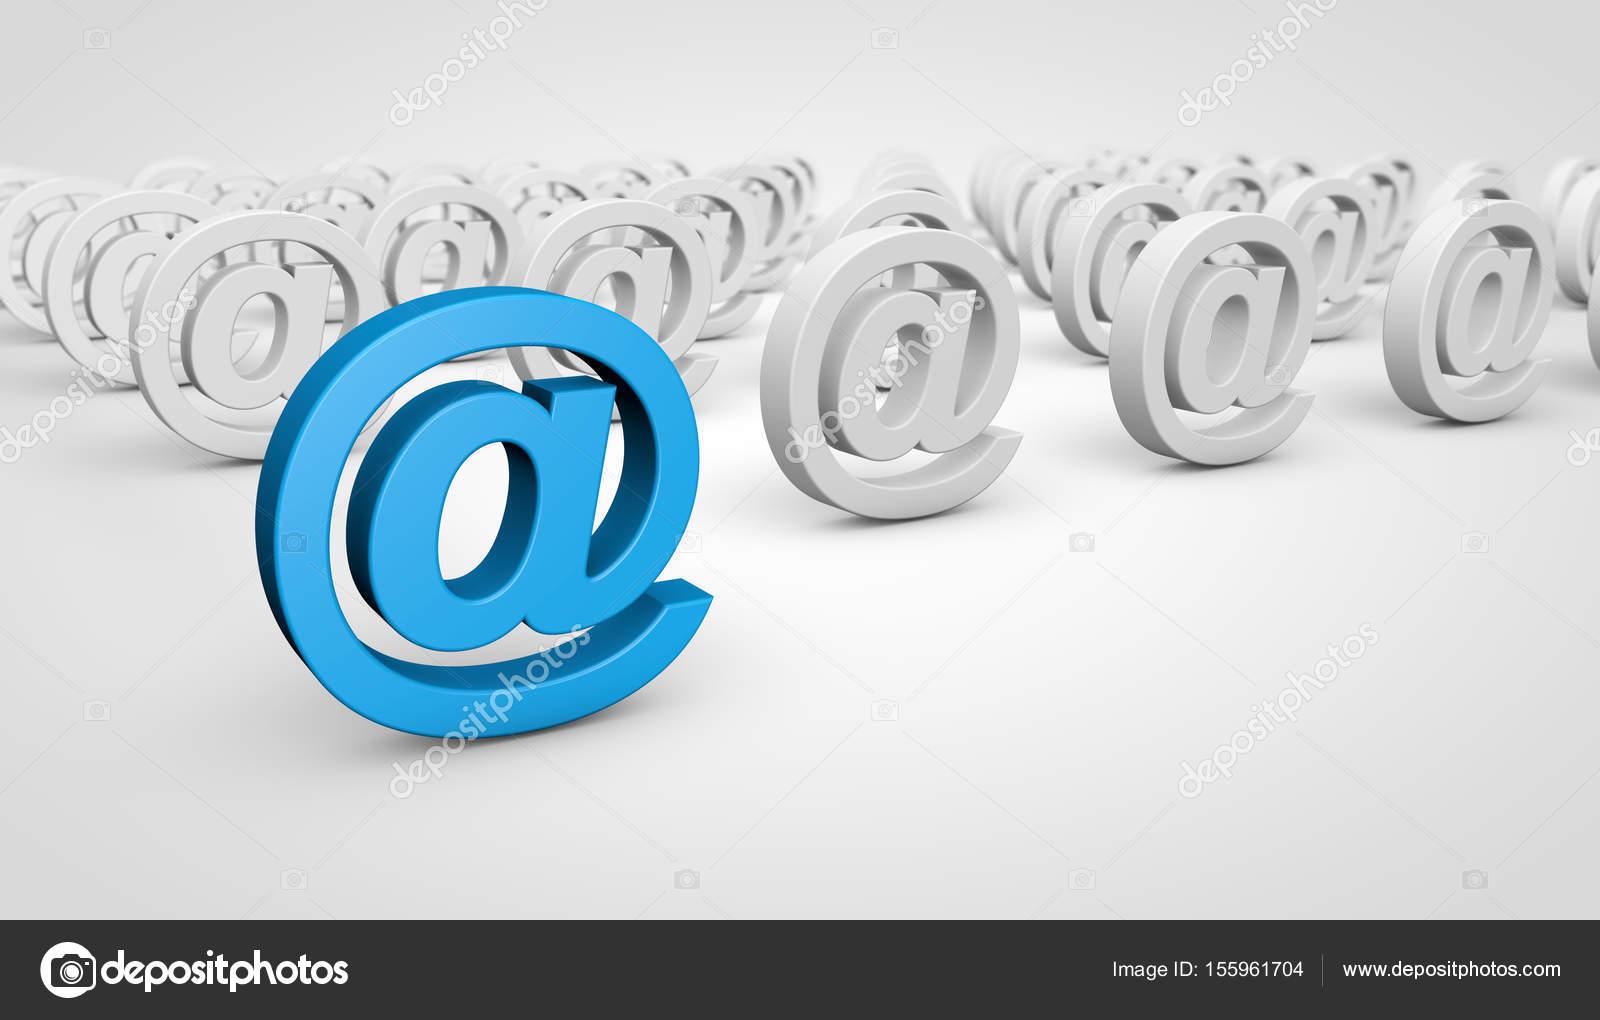 Web Contact Us At Symbol Concept — Stock Photo © NiroDesign #155961704